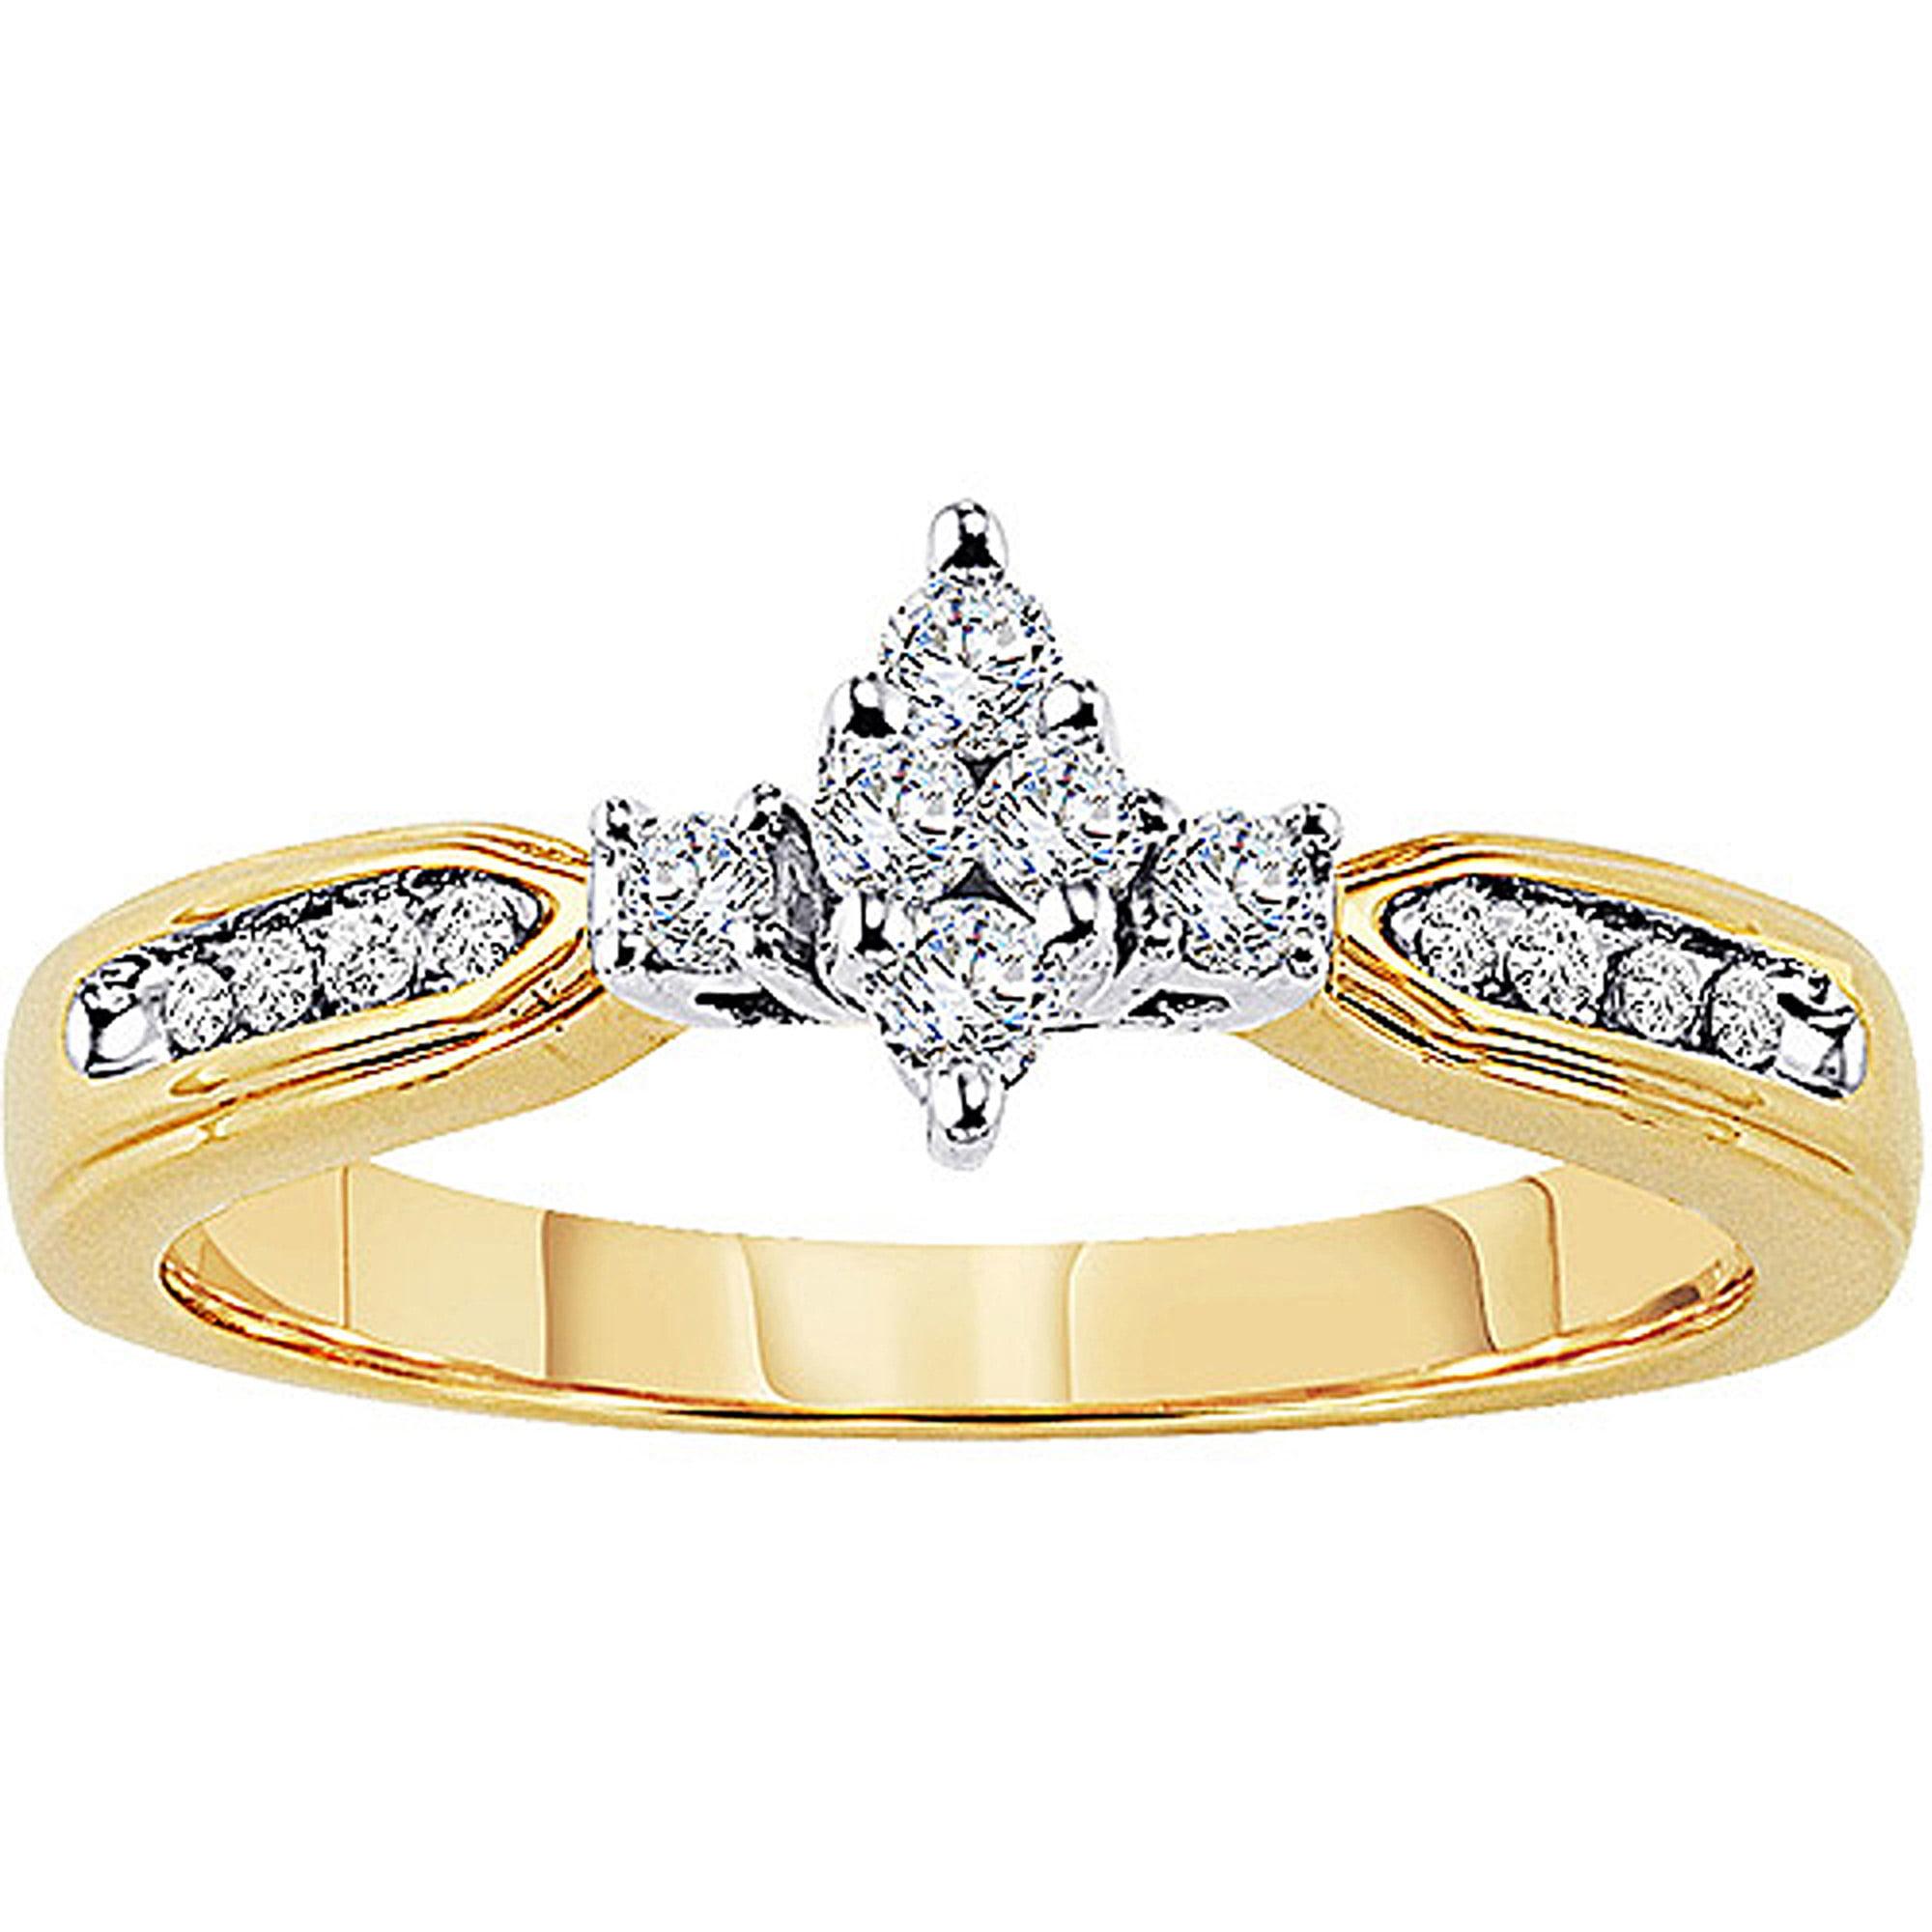 Keepsake Lovelight 1/4 Carat T.W. Diamond 10kt Yellow Gold Engagement Ring